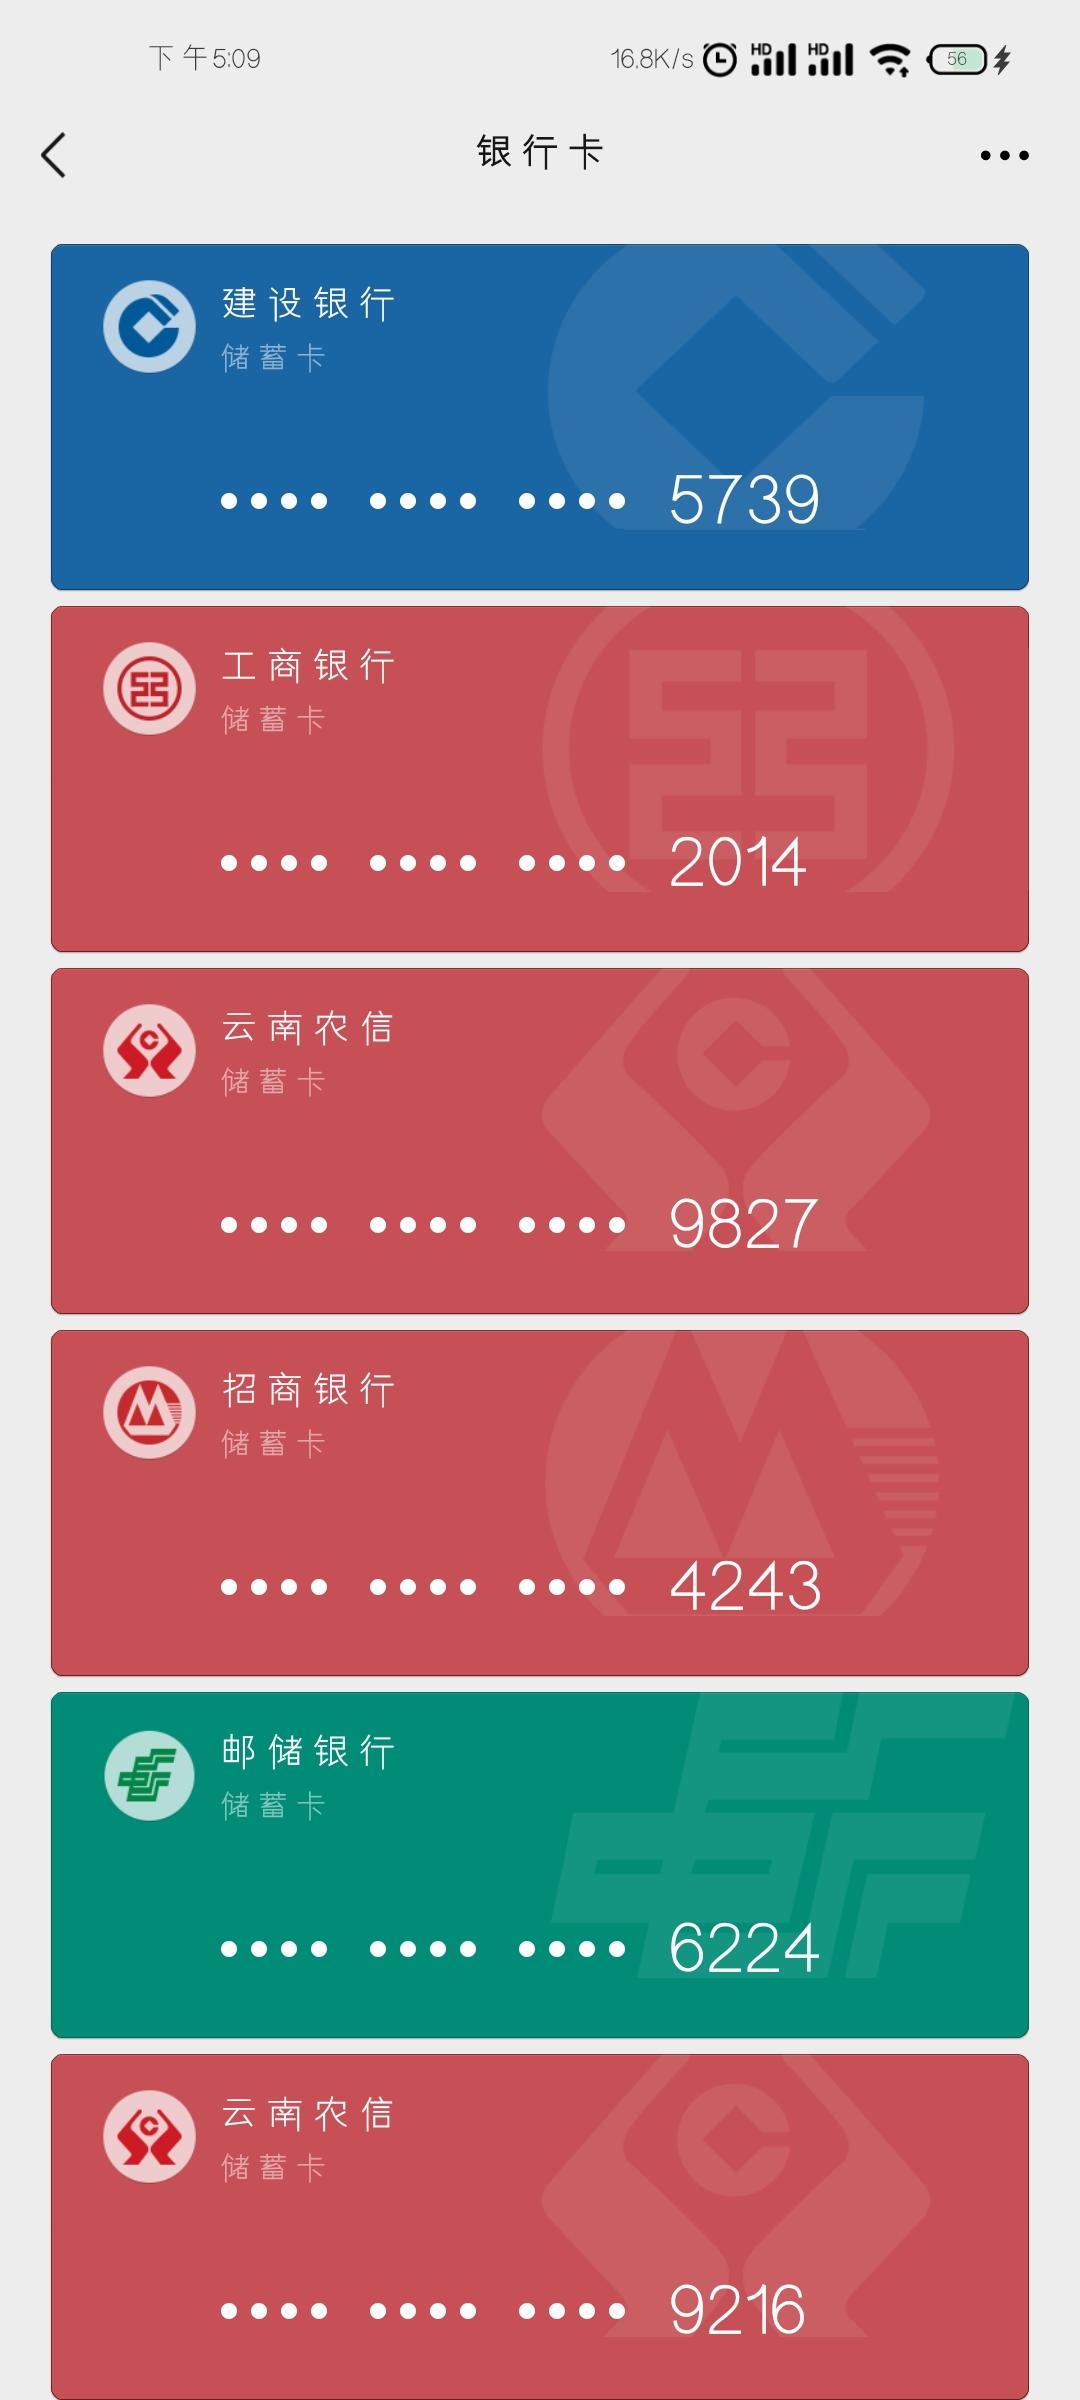 Screenshot_2021-06-29-17-09-11-660_com.tencent.mm.jpg